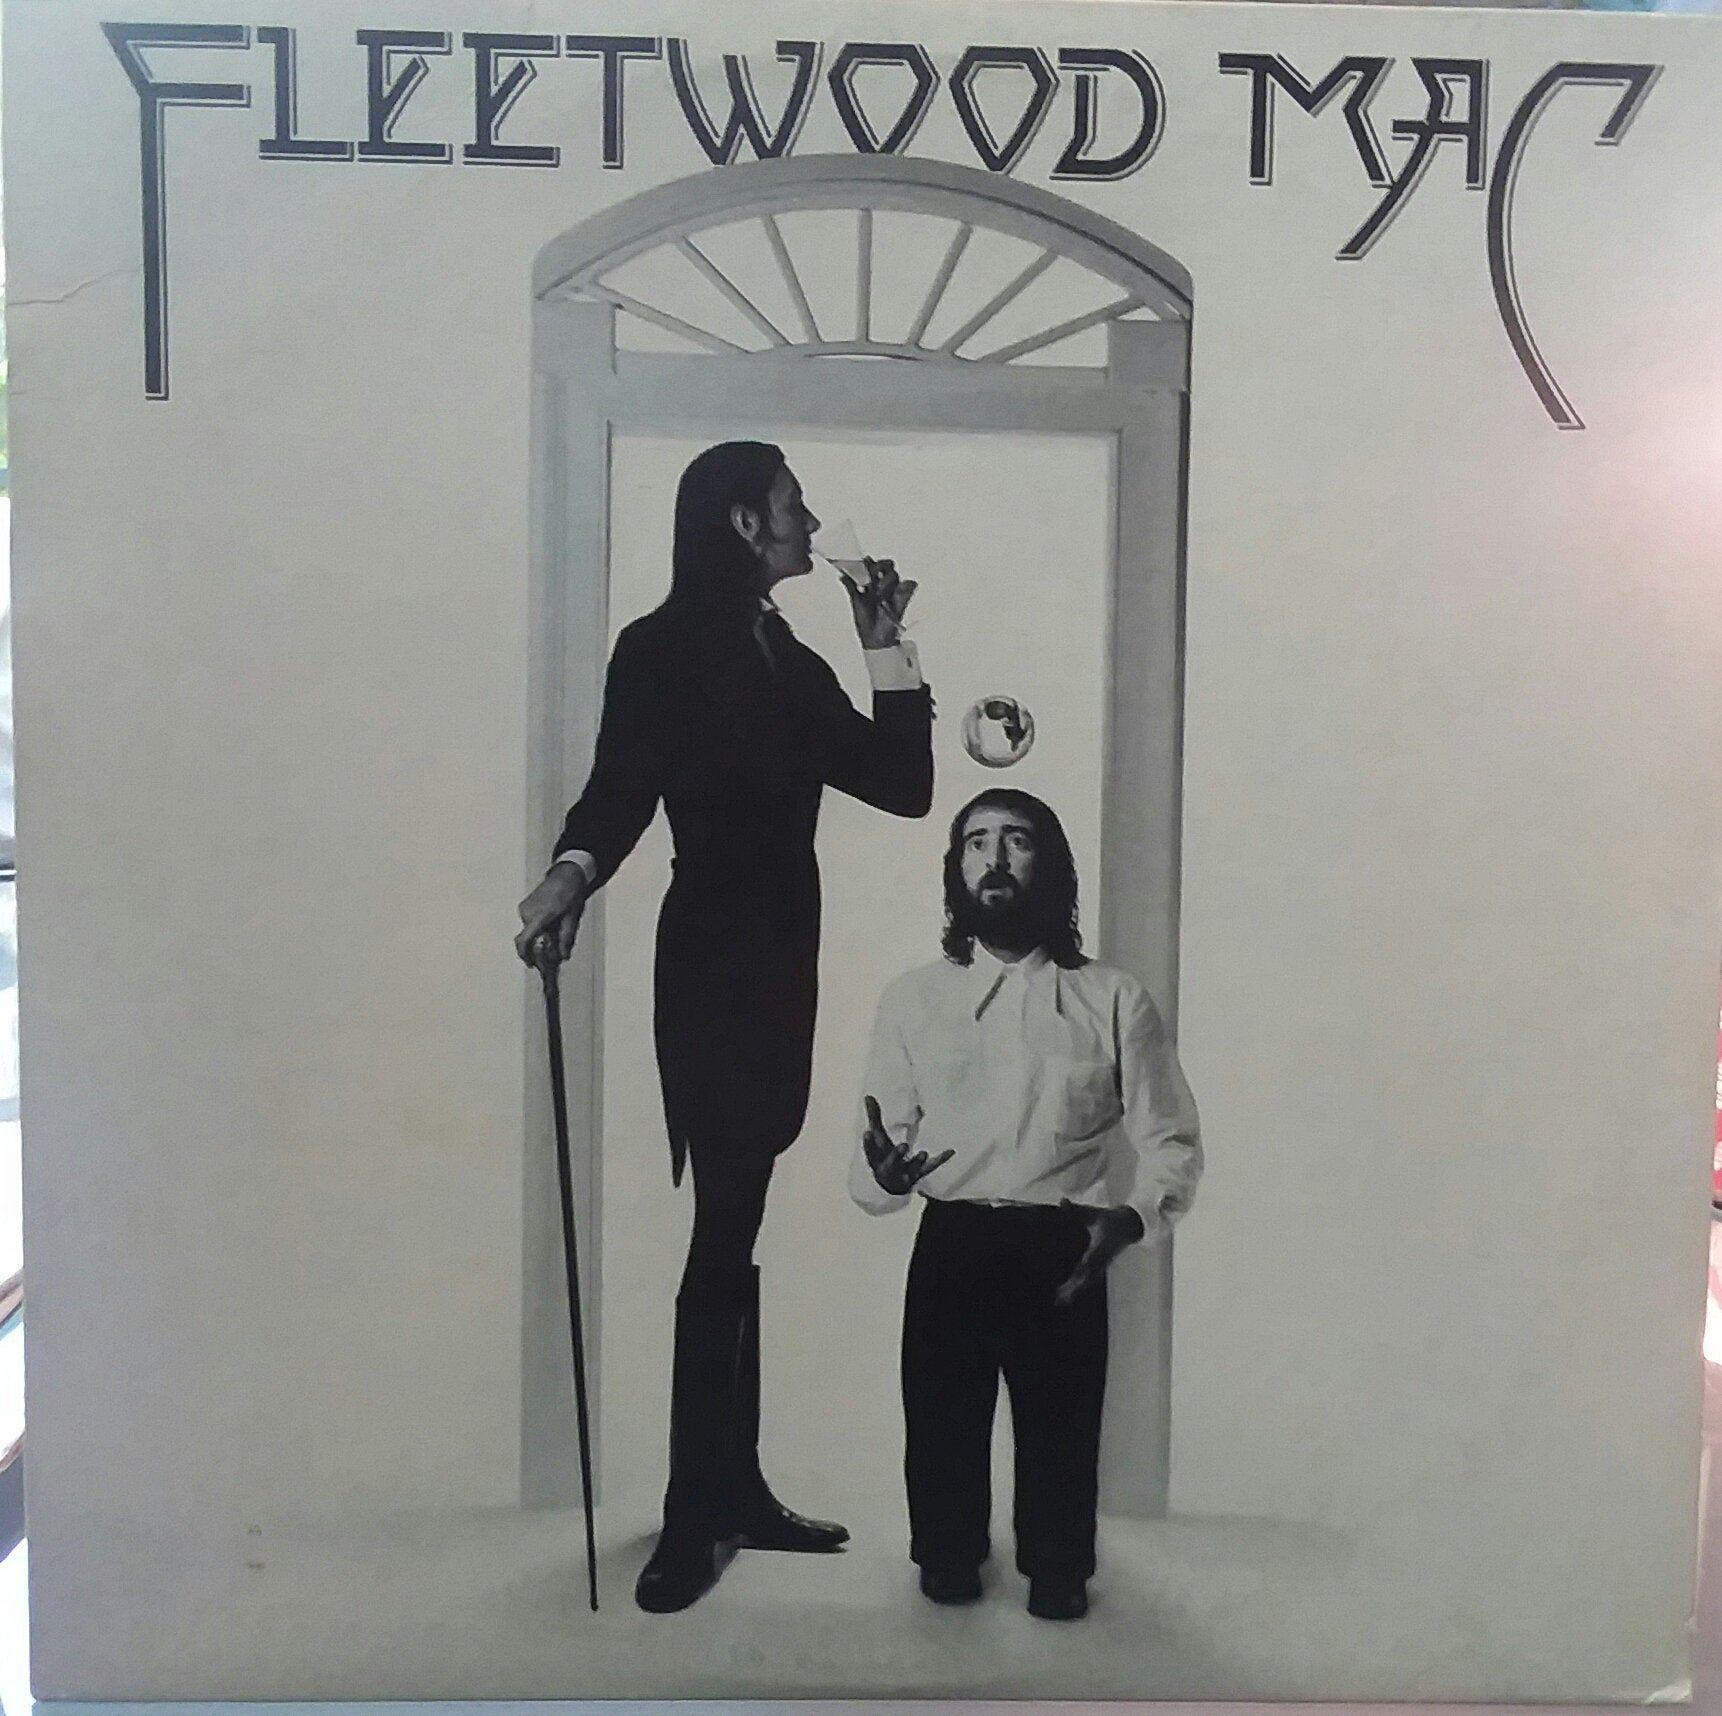 Fleetwood Mac Self Titled 1975 Album Vintage Record Album Vinyl Lp Classic Rock And Rock Music British American Rock Fleetwood Mac Fleetwood Saddest Songs